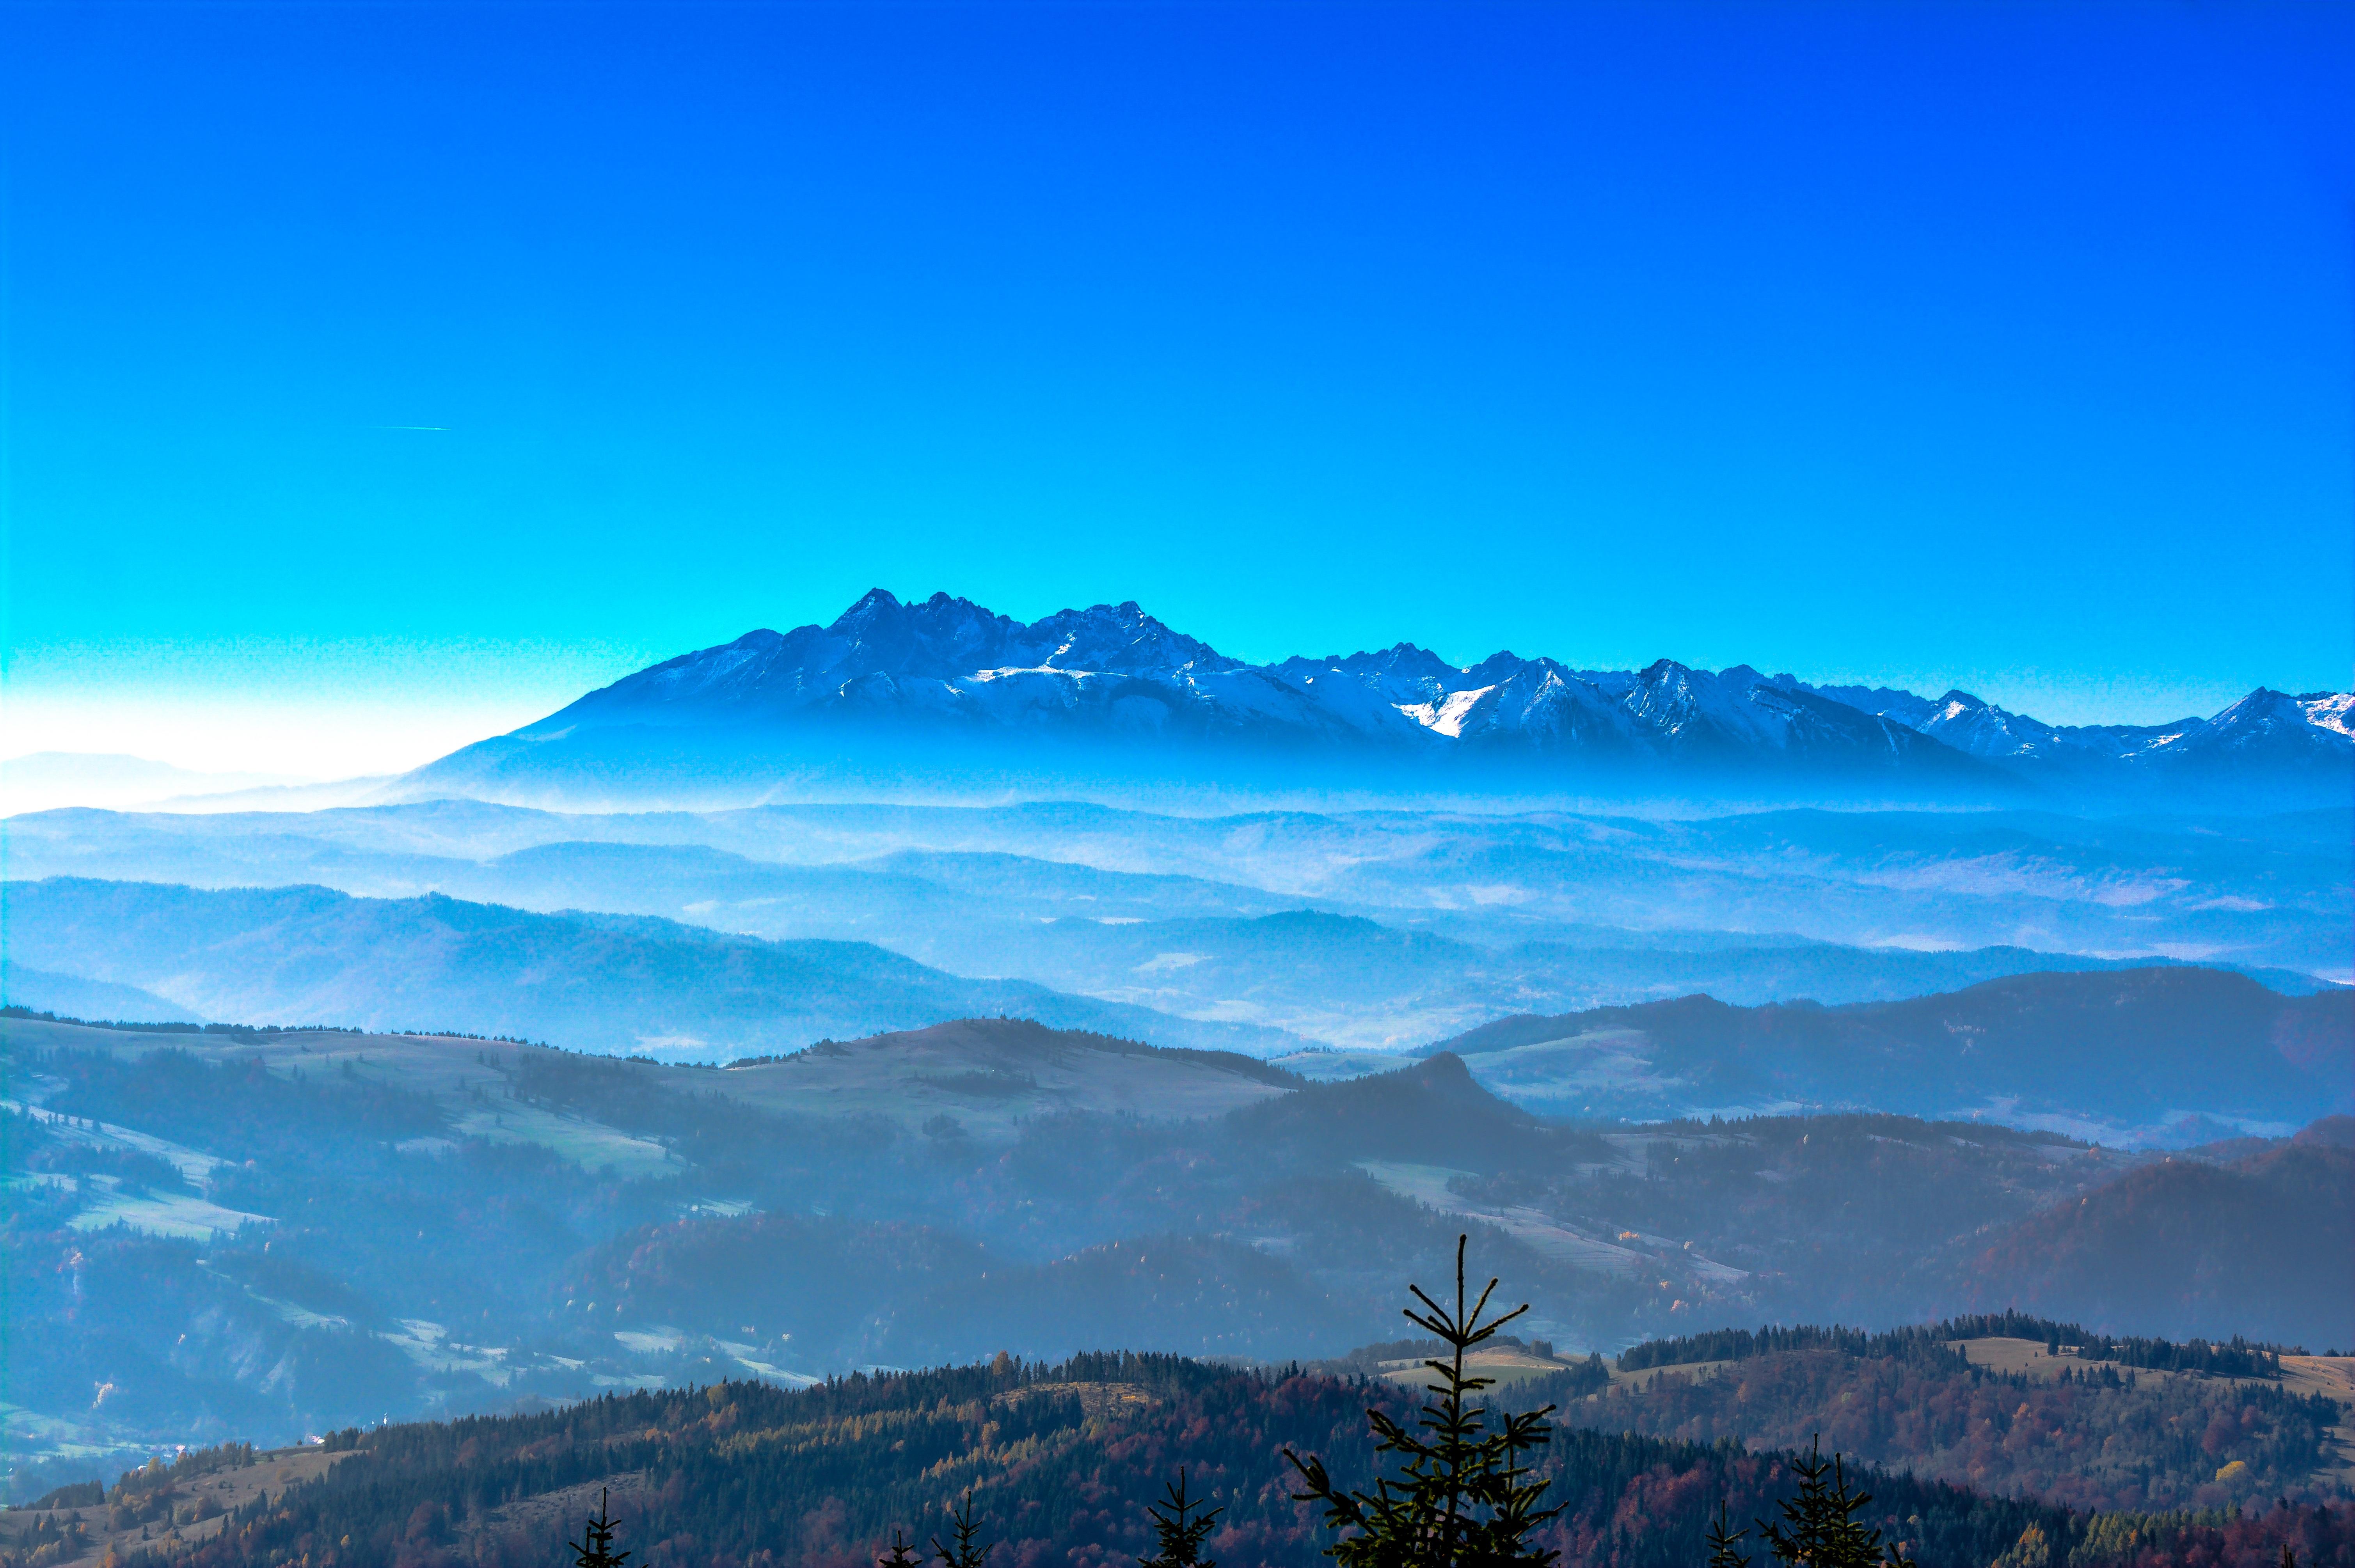 Gambar Pohon Horison Gunung Awan Langit Pagi Fajar